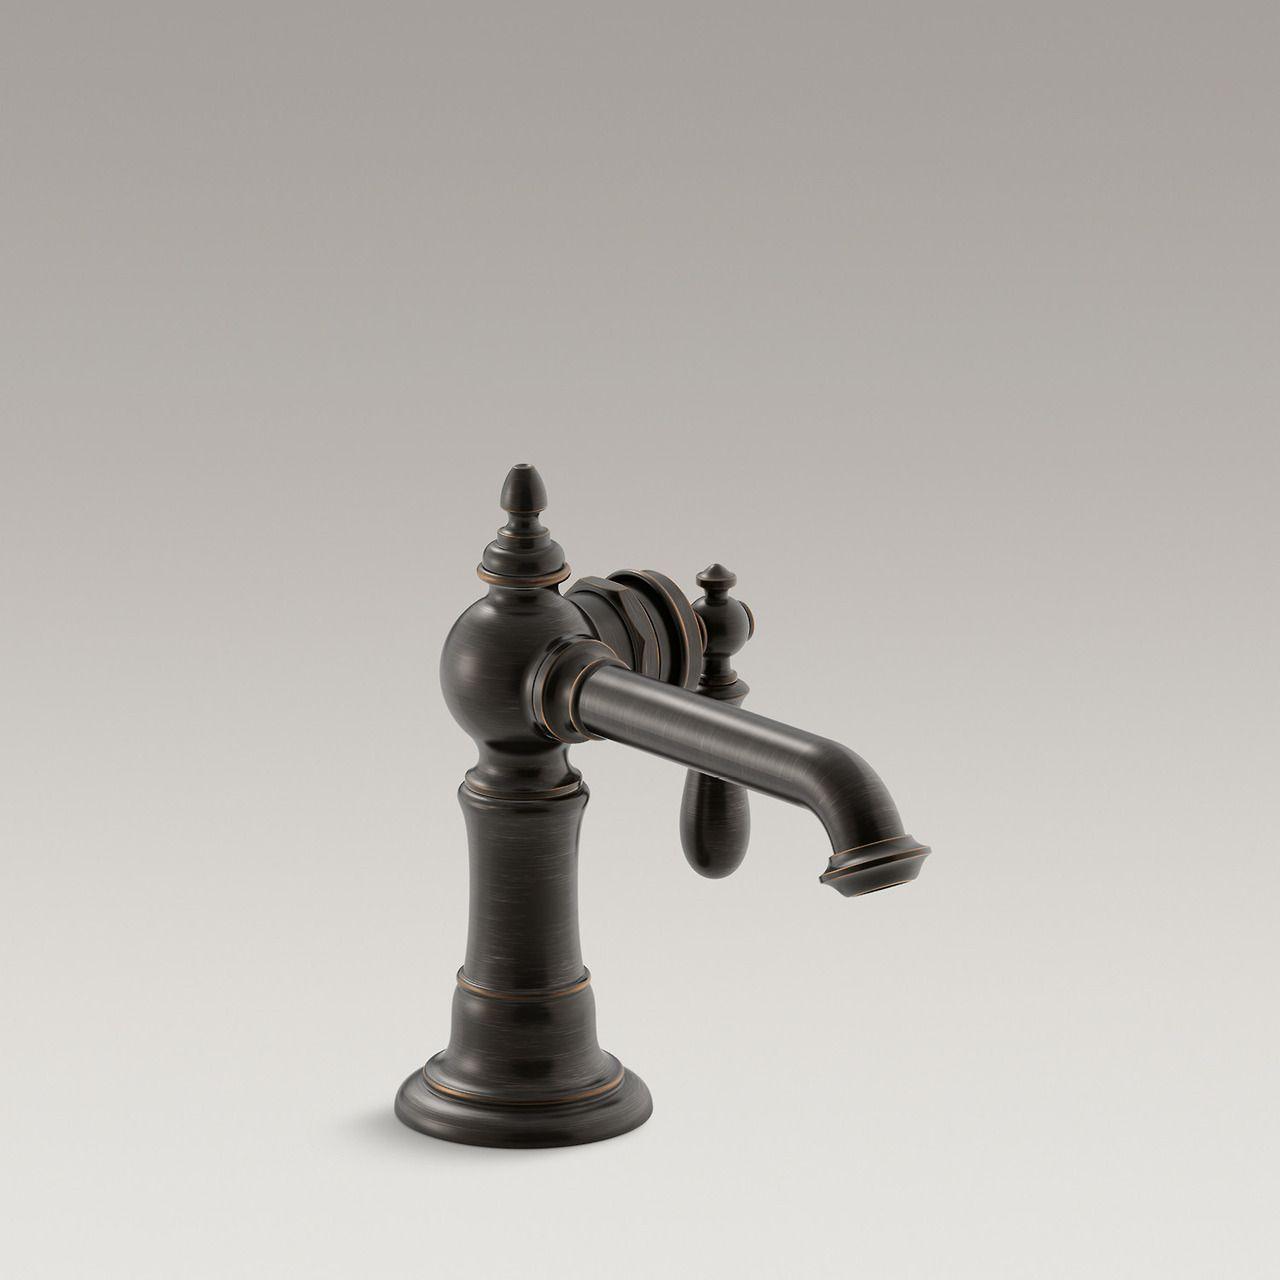 Artifacts Single-Handle Bathroom Sink Faucet